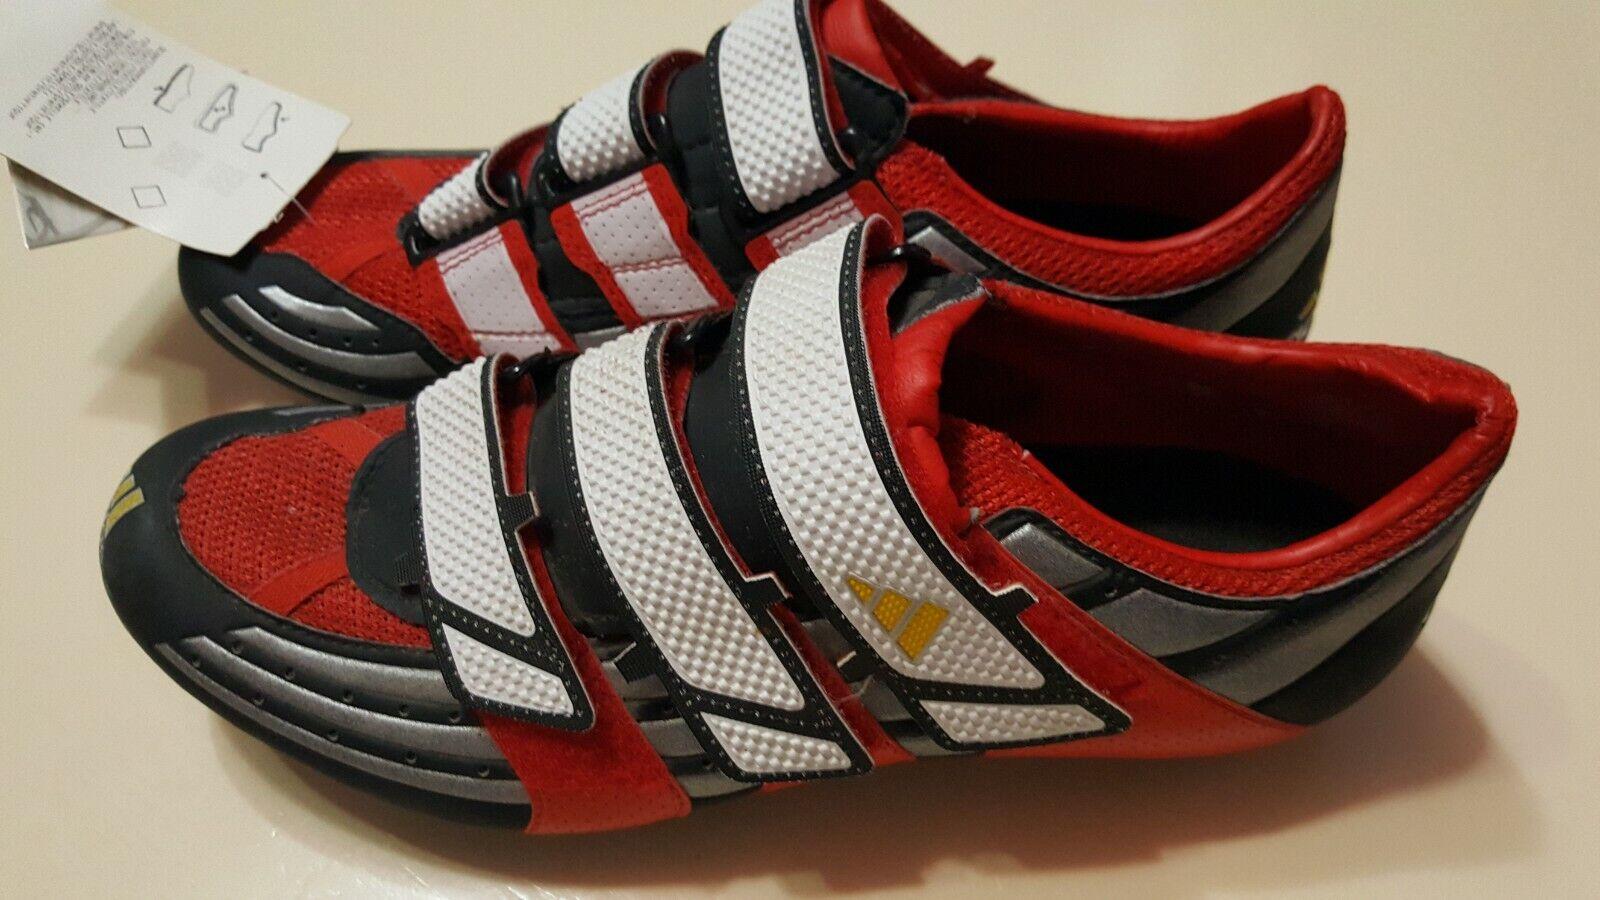 Adidas TT ADISTAR road bike carbon shoes cycling SPD compatible